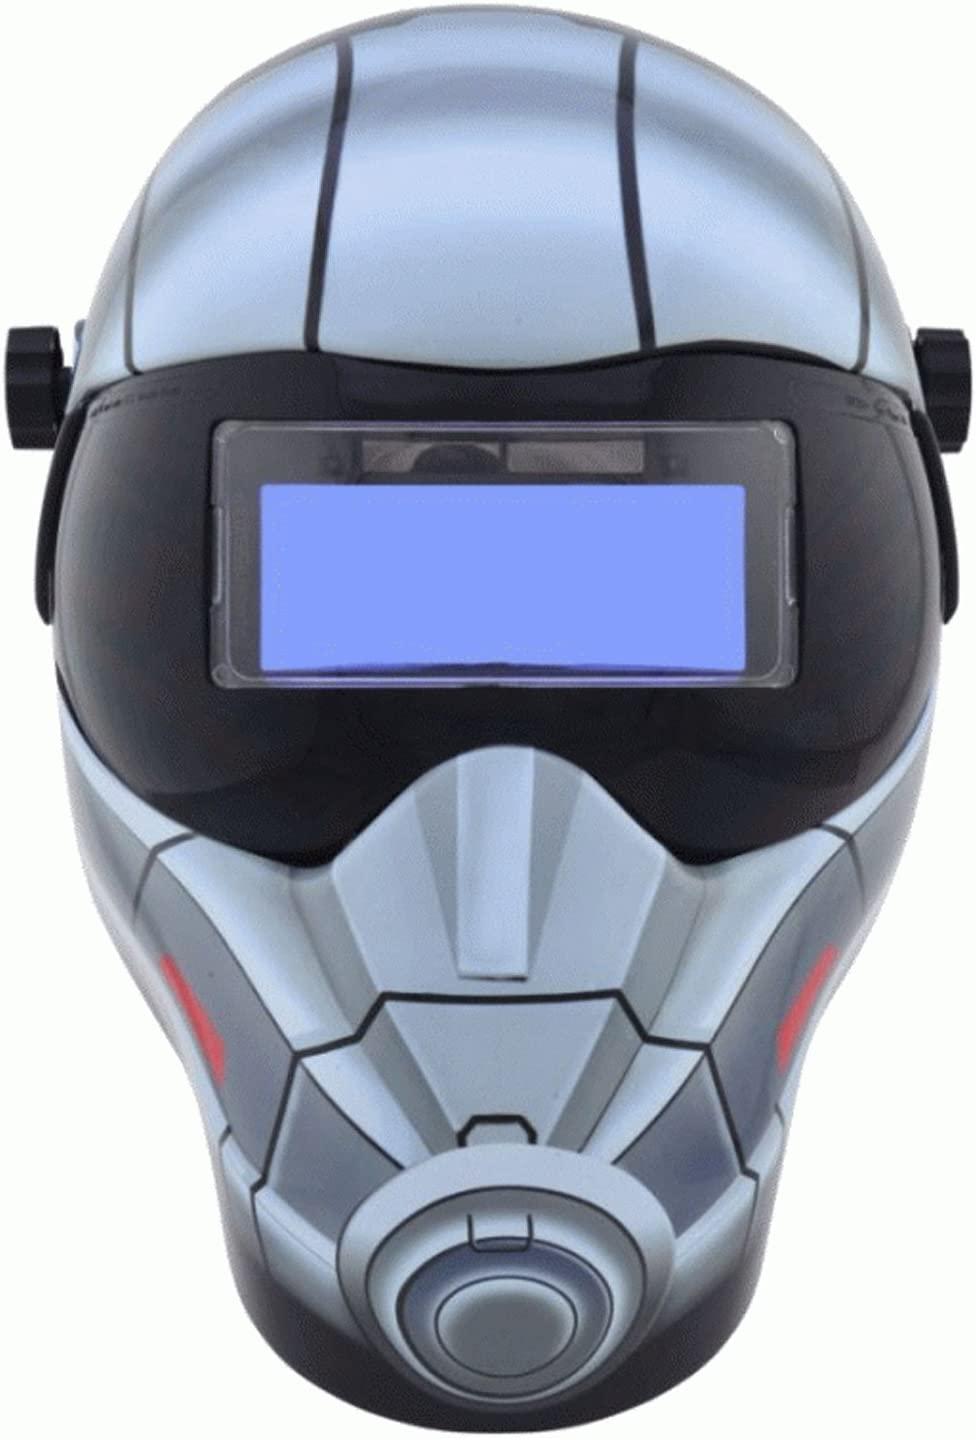 "Save Phace 3012503 /""iron Man/"" I-series Welding Helmet"